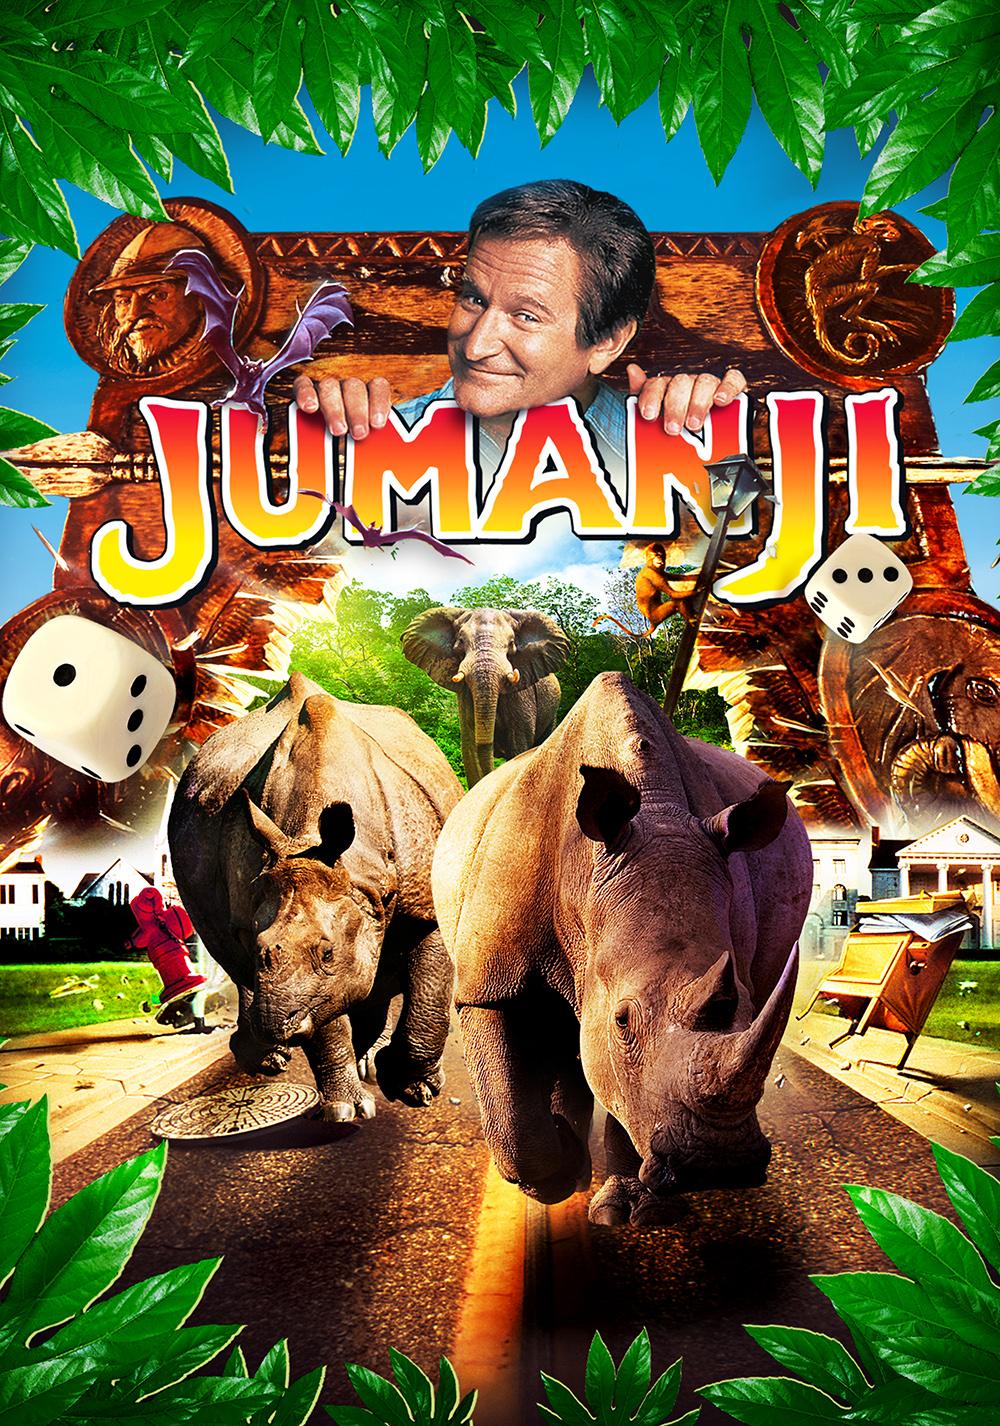 Jumanji-1995-Poster-jumanji-40536736-1000-1426.jpg